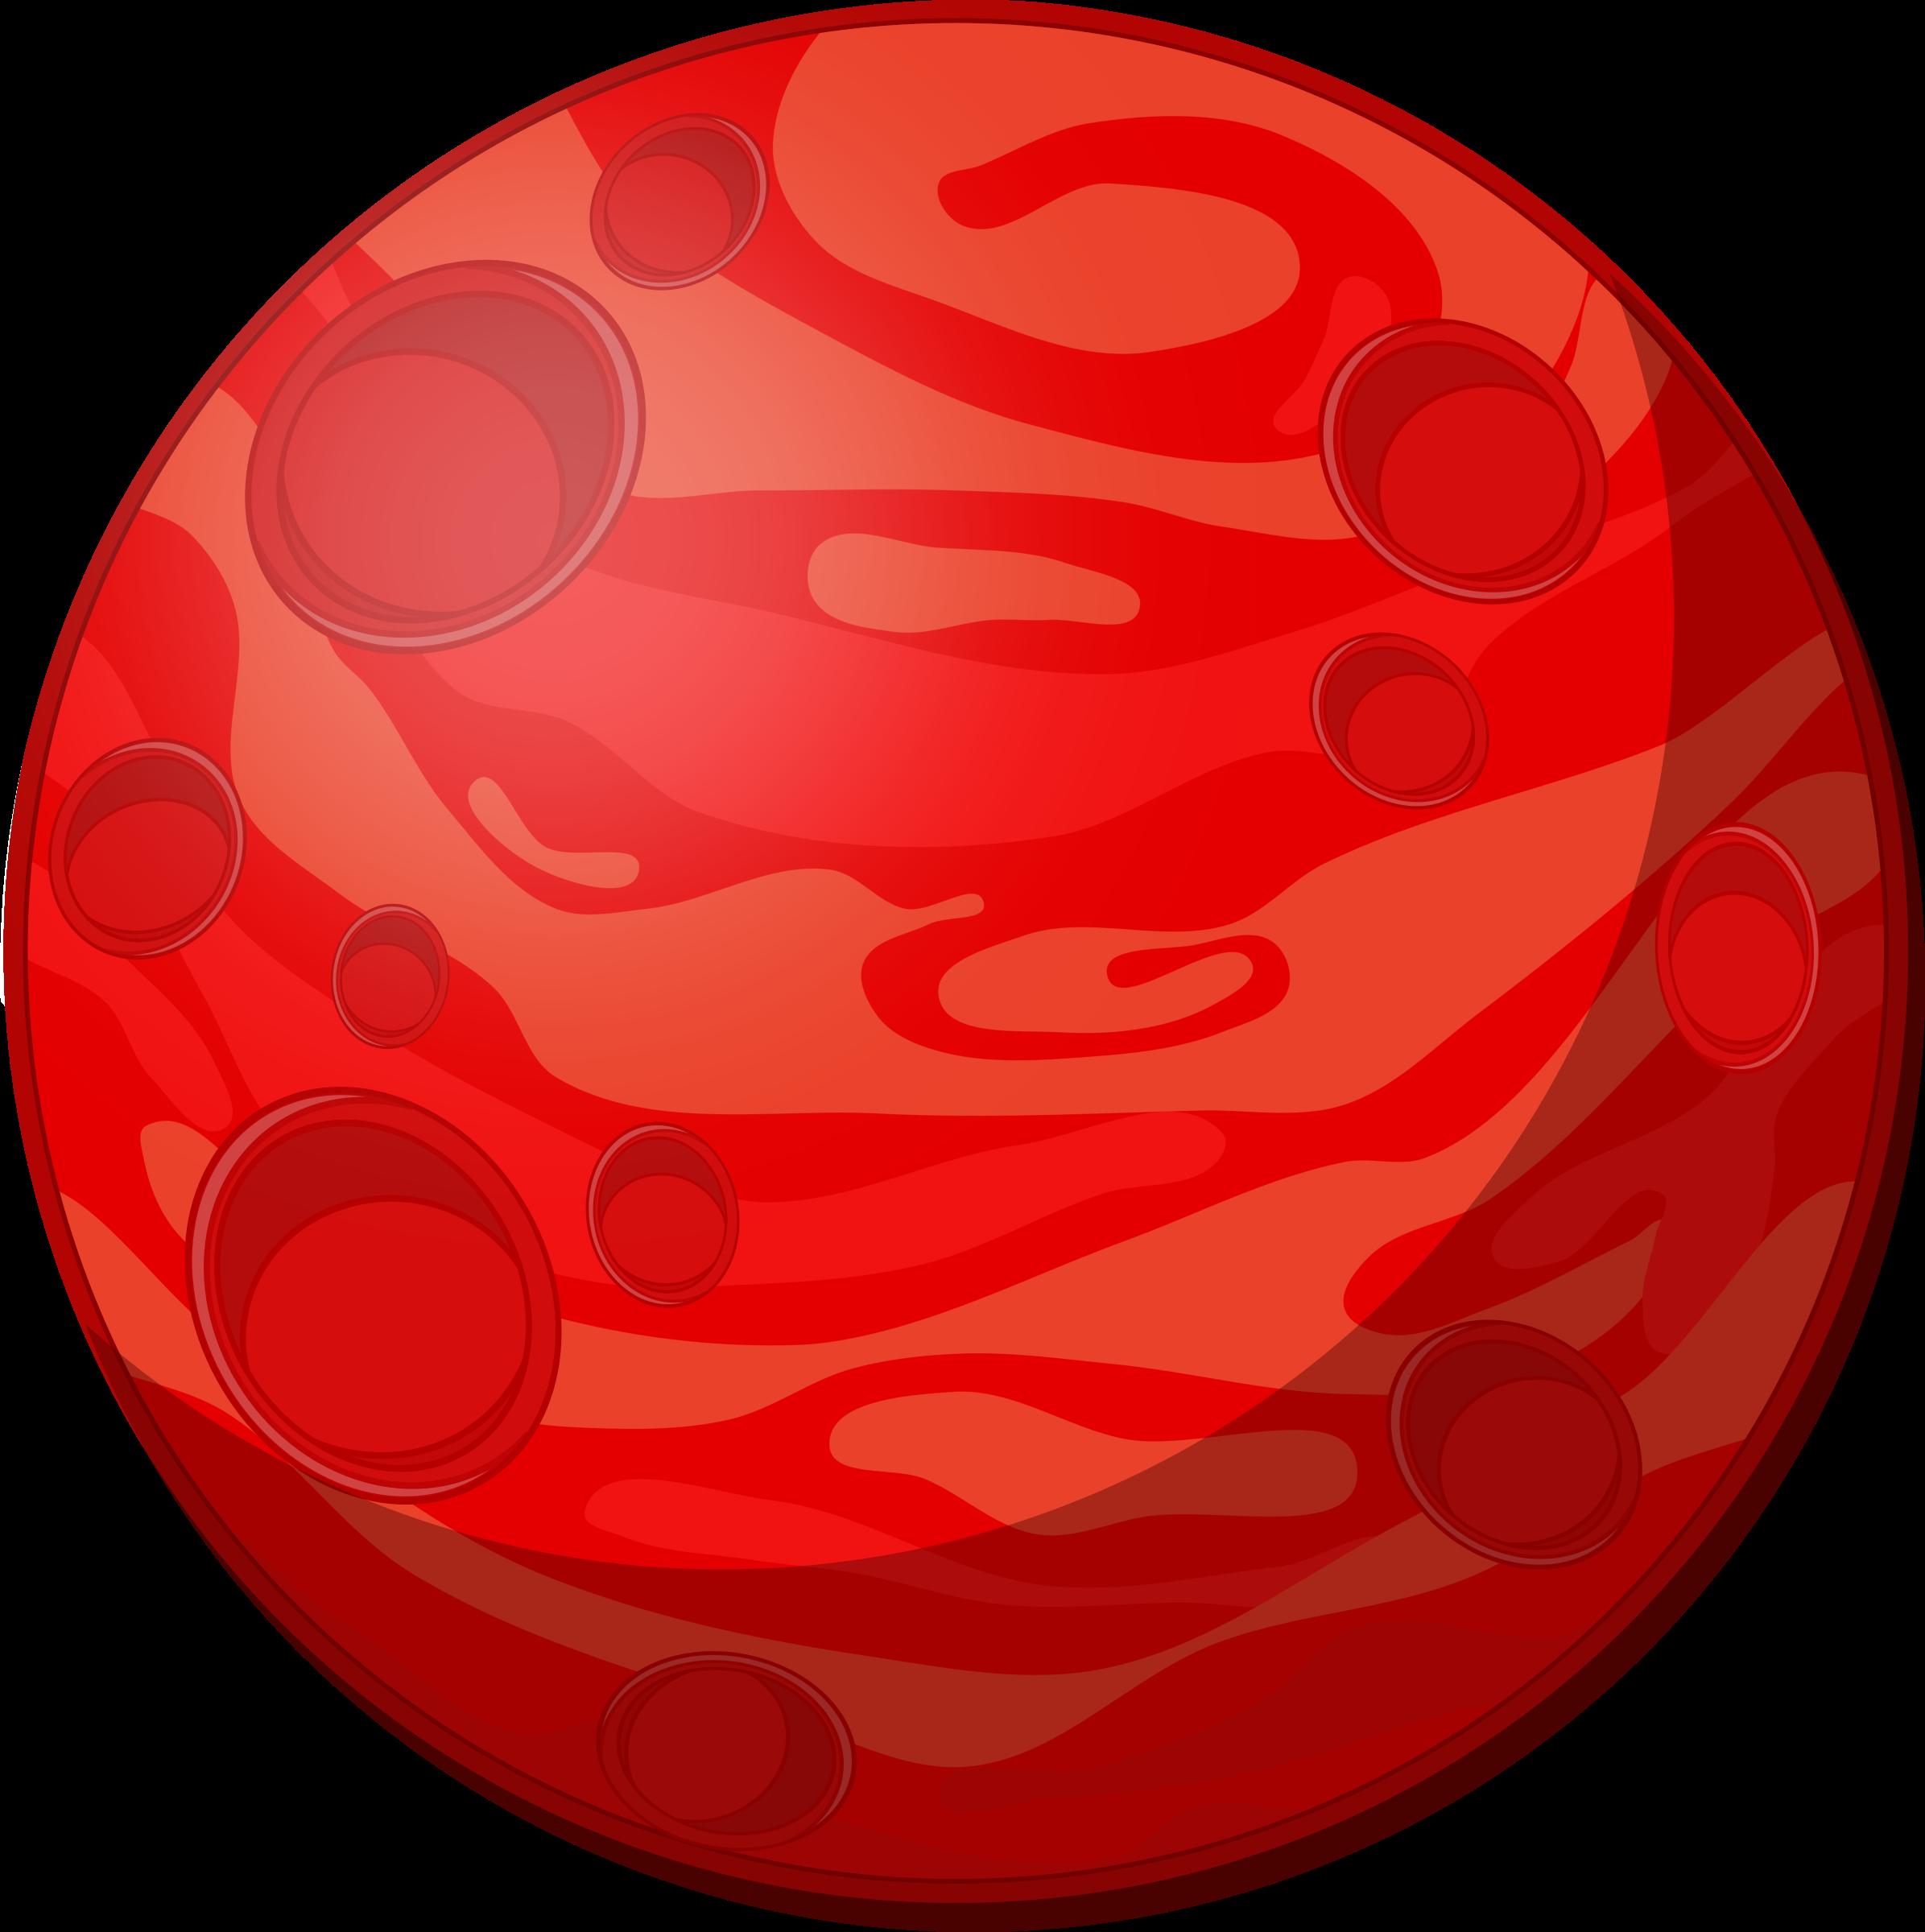 Remix of red big. Planet clipart cartoon